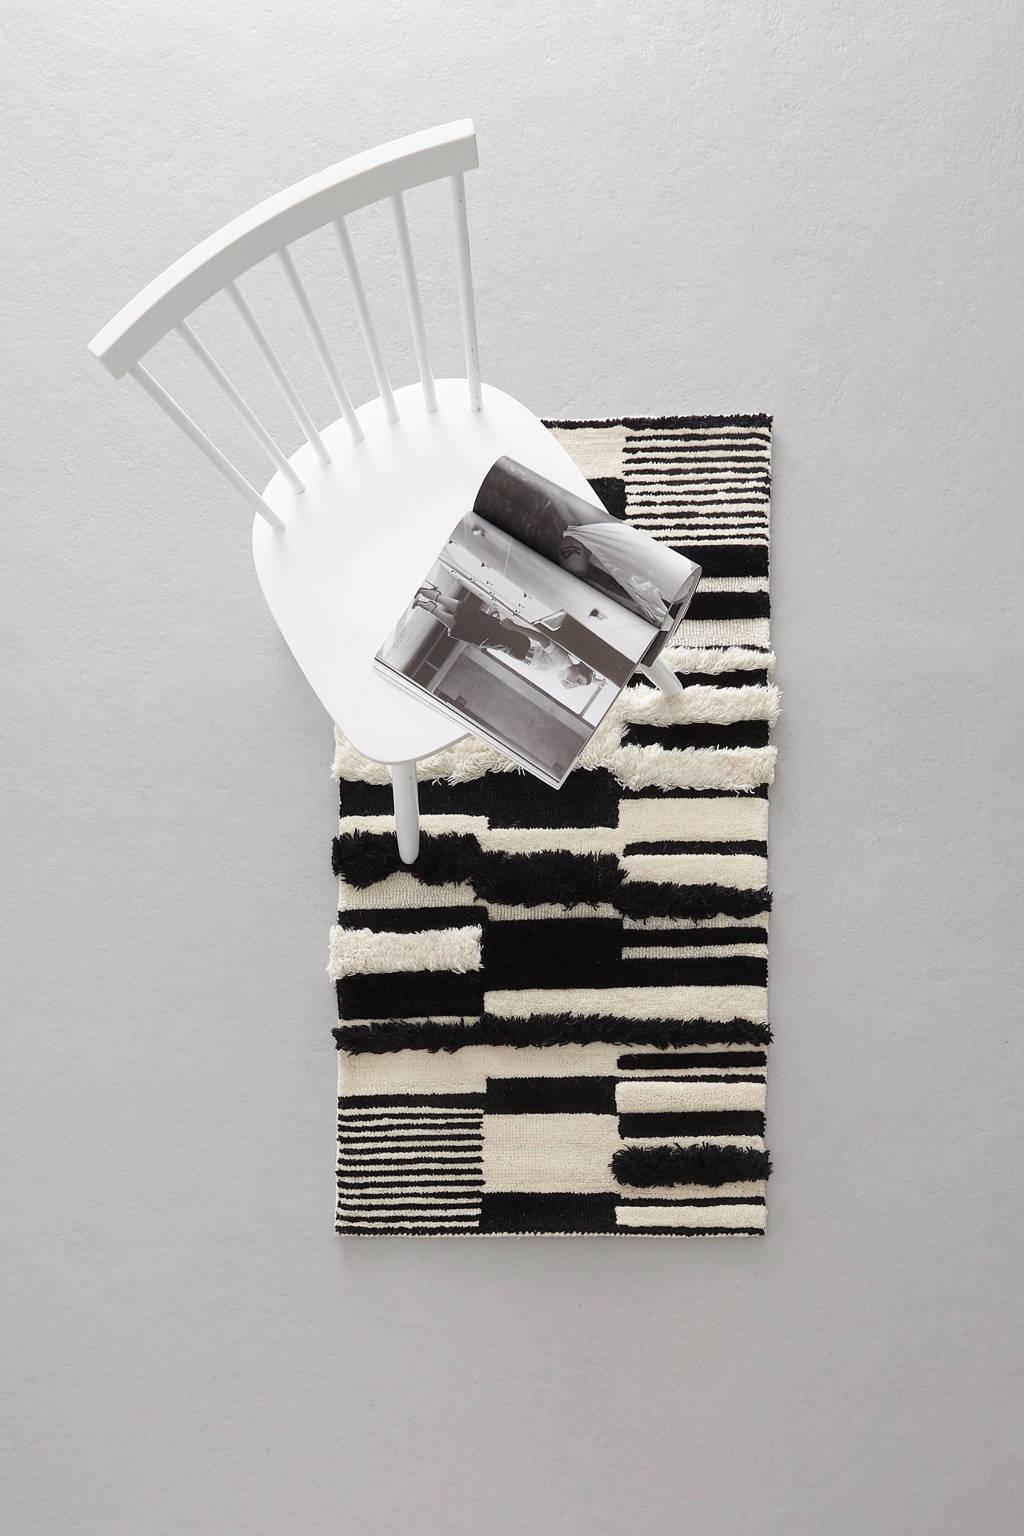 whkmp's own wollen vloerkleed  (120x60 cm)